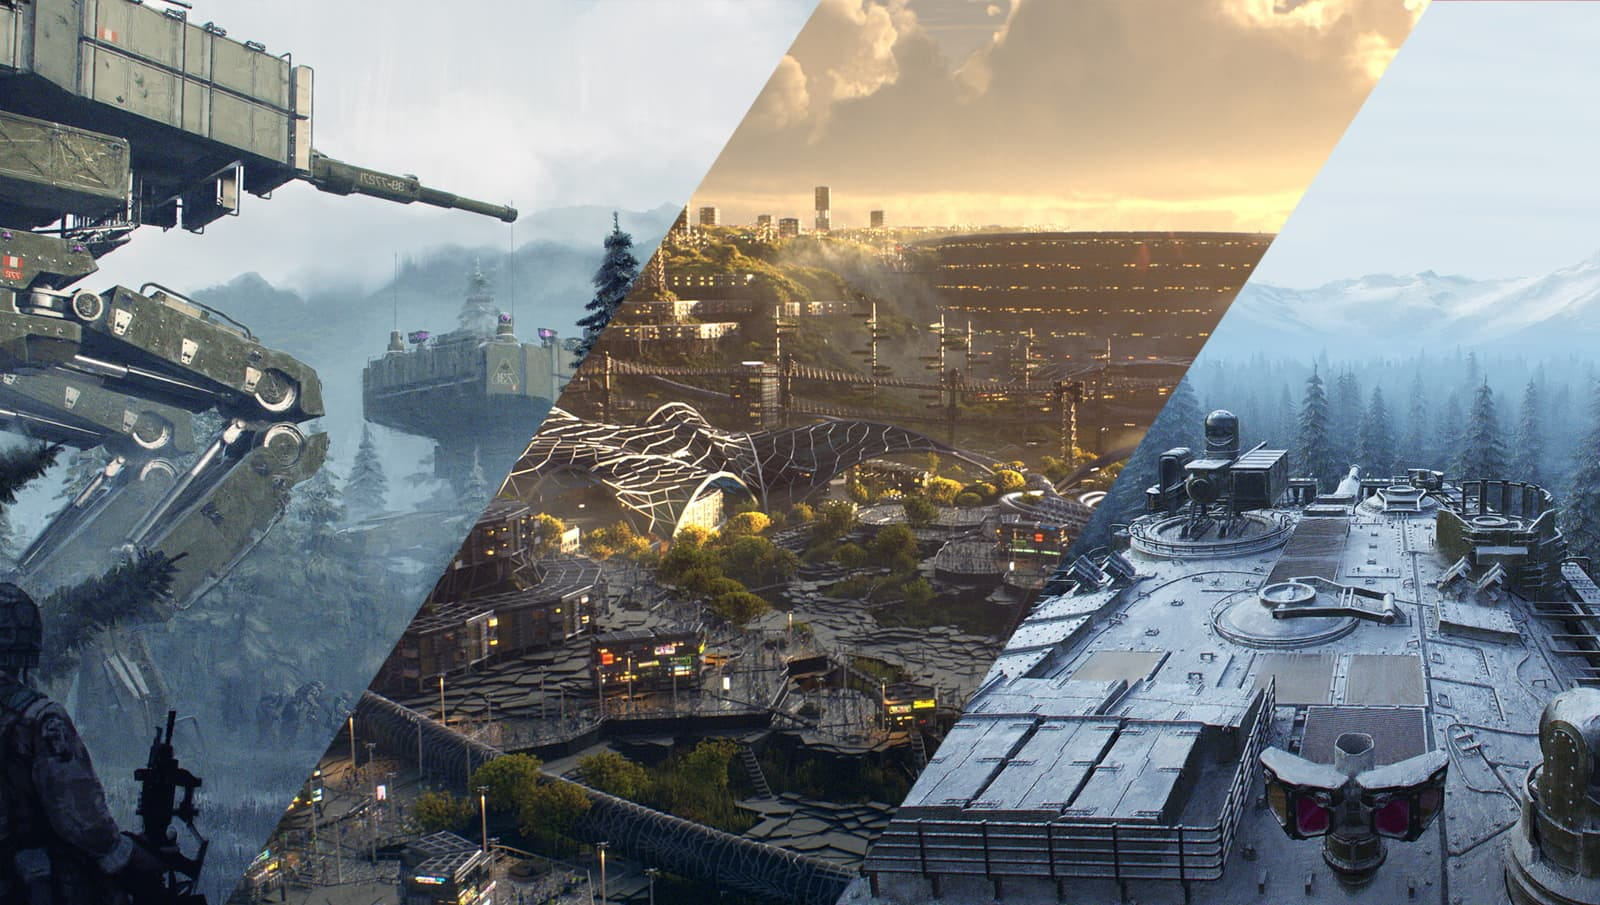 Interview with Gears Of War 5 Artist - Jeff Bartzis